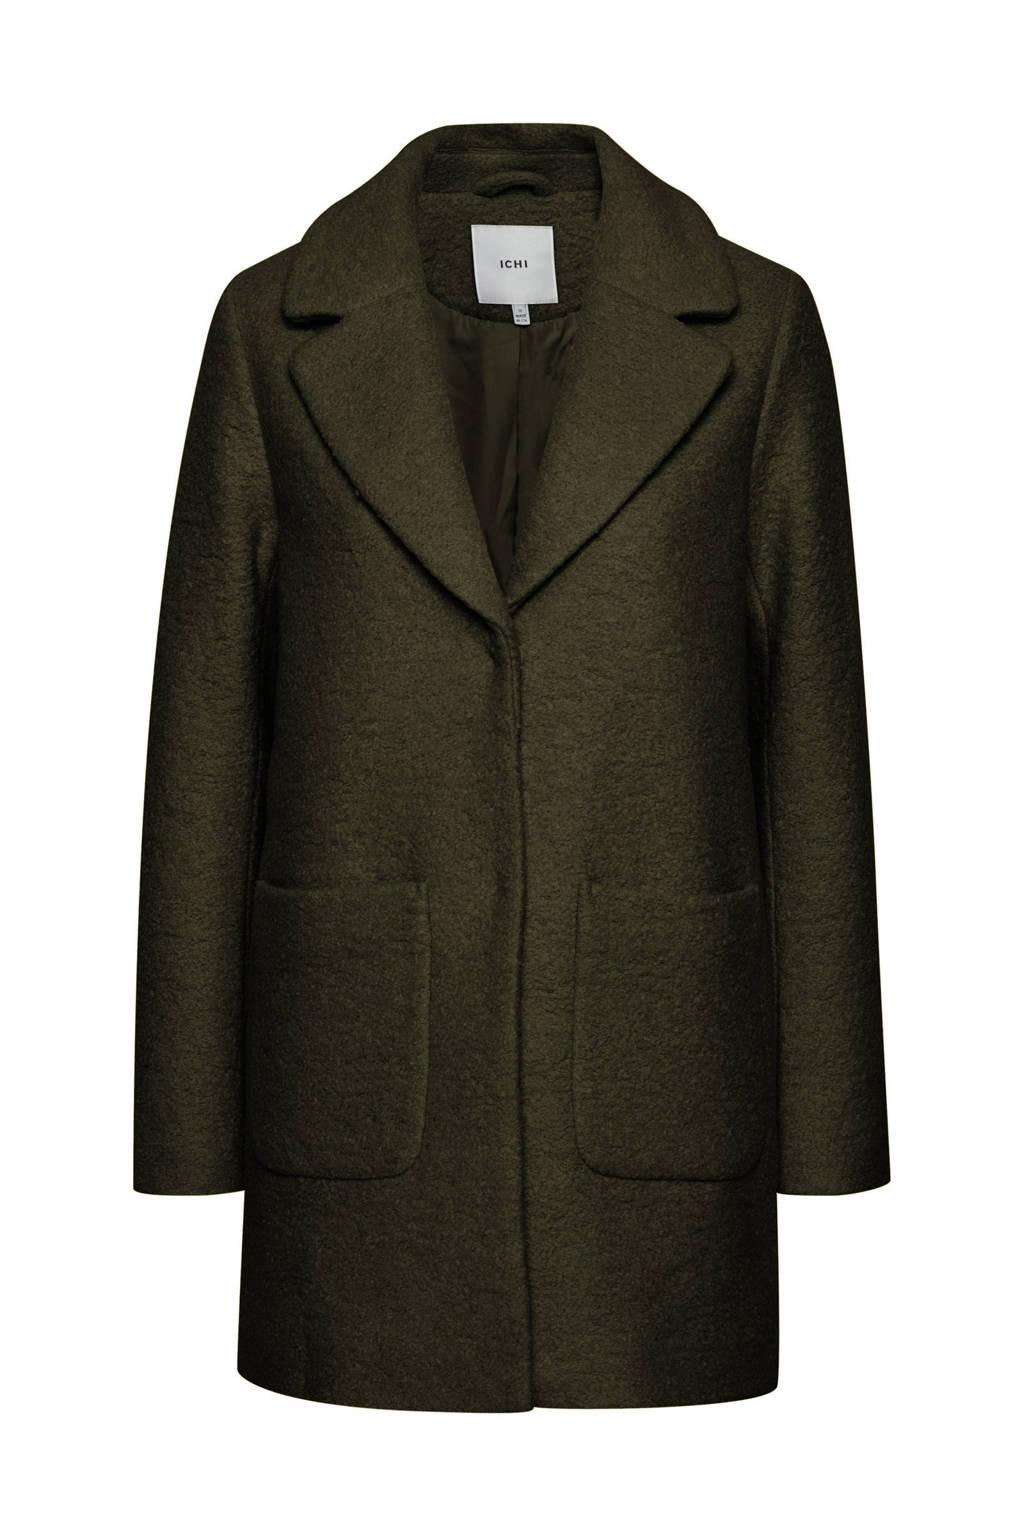 ICHI  coat winter IHSTIPA met wol donkergroen, Donkergroen